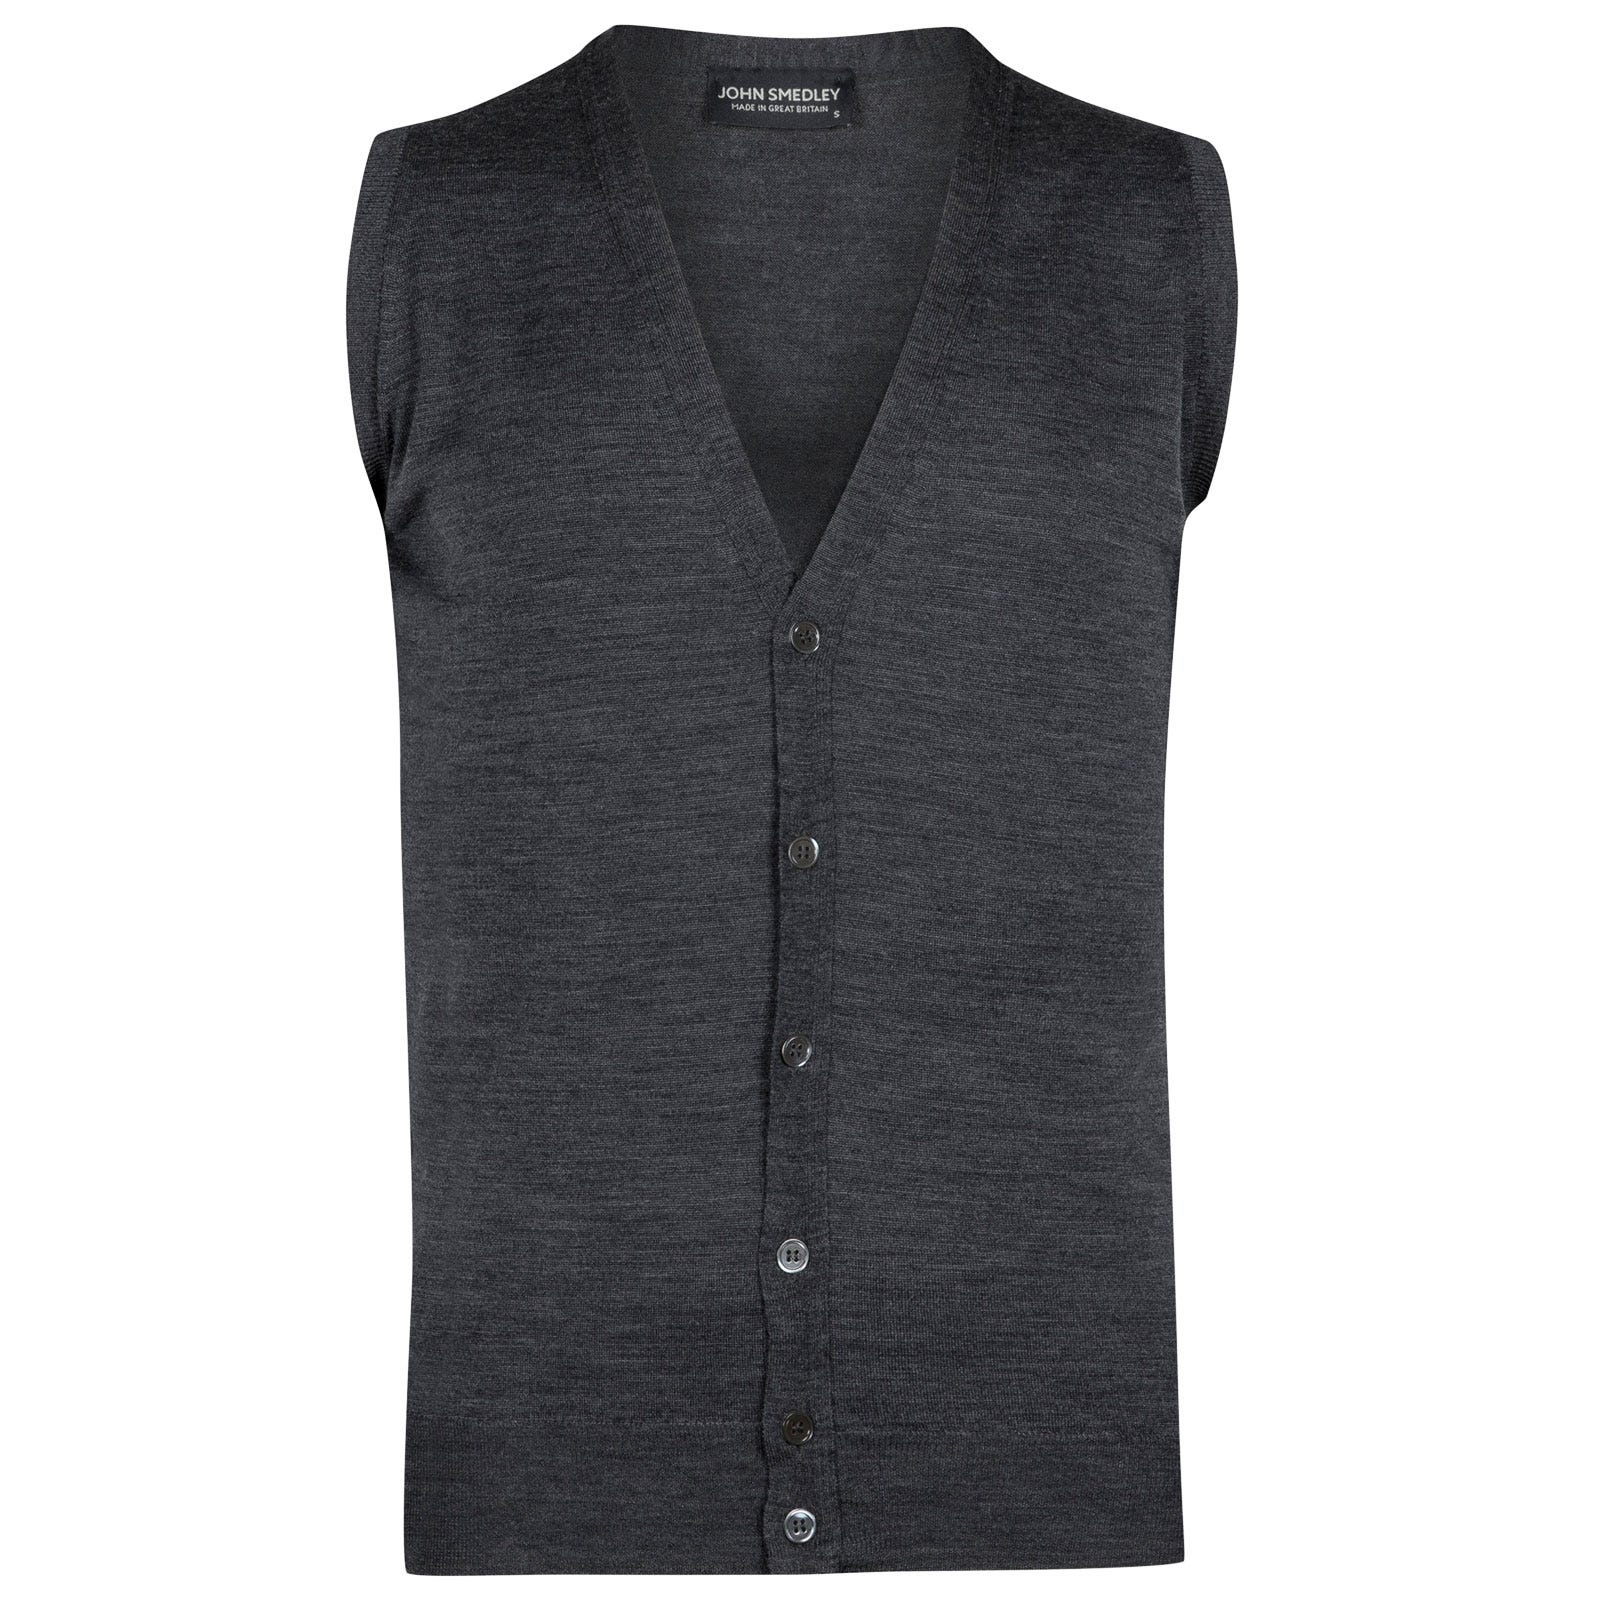 John Smedley huntswood Merino Wool Waistcoat in Charcoal-XXL